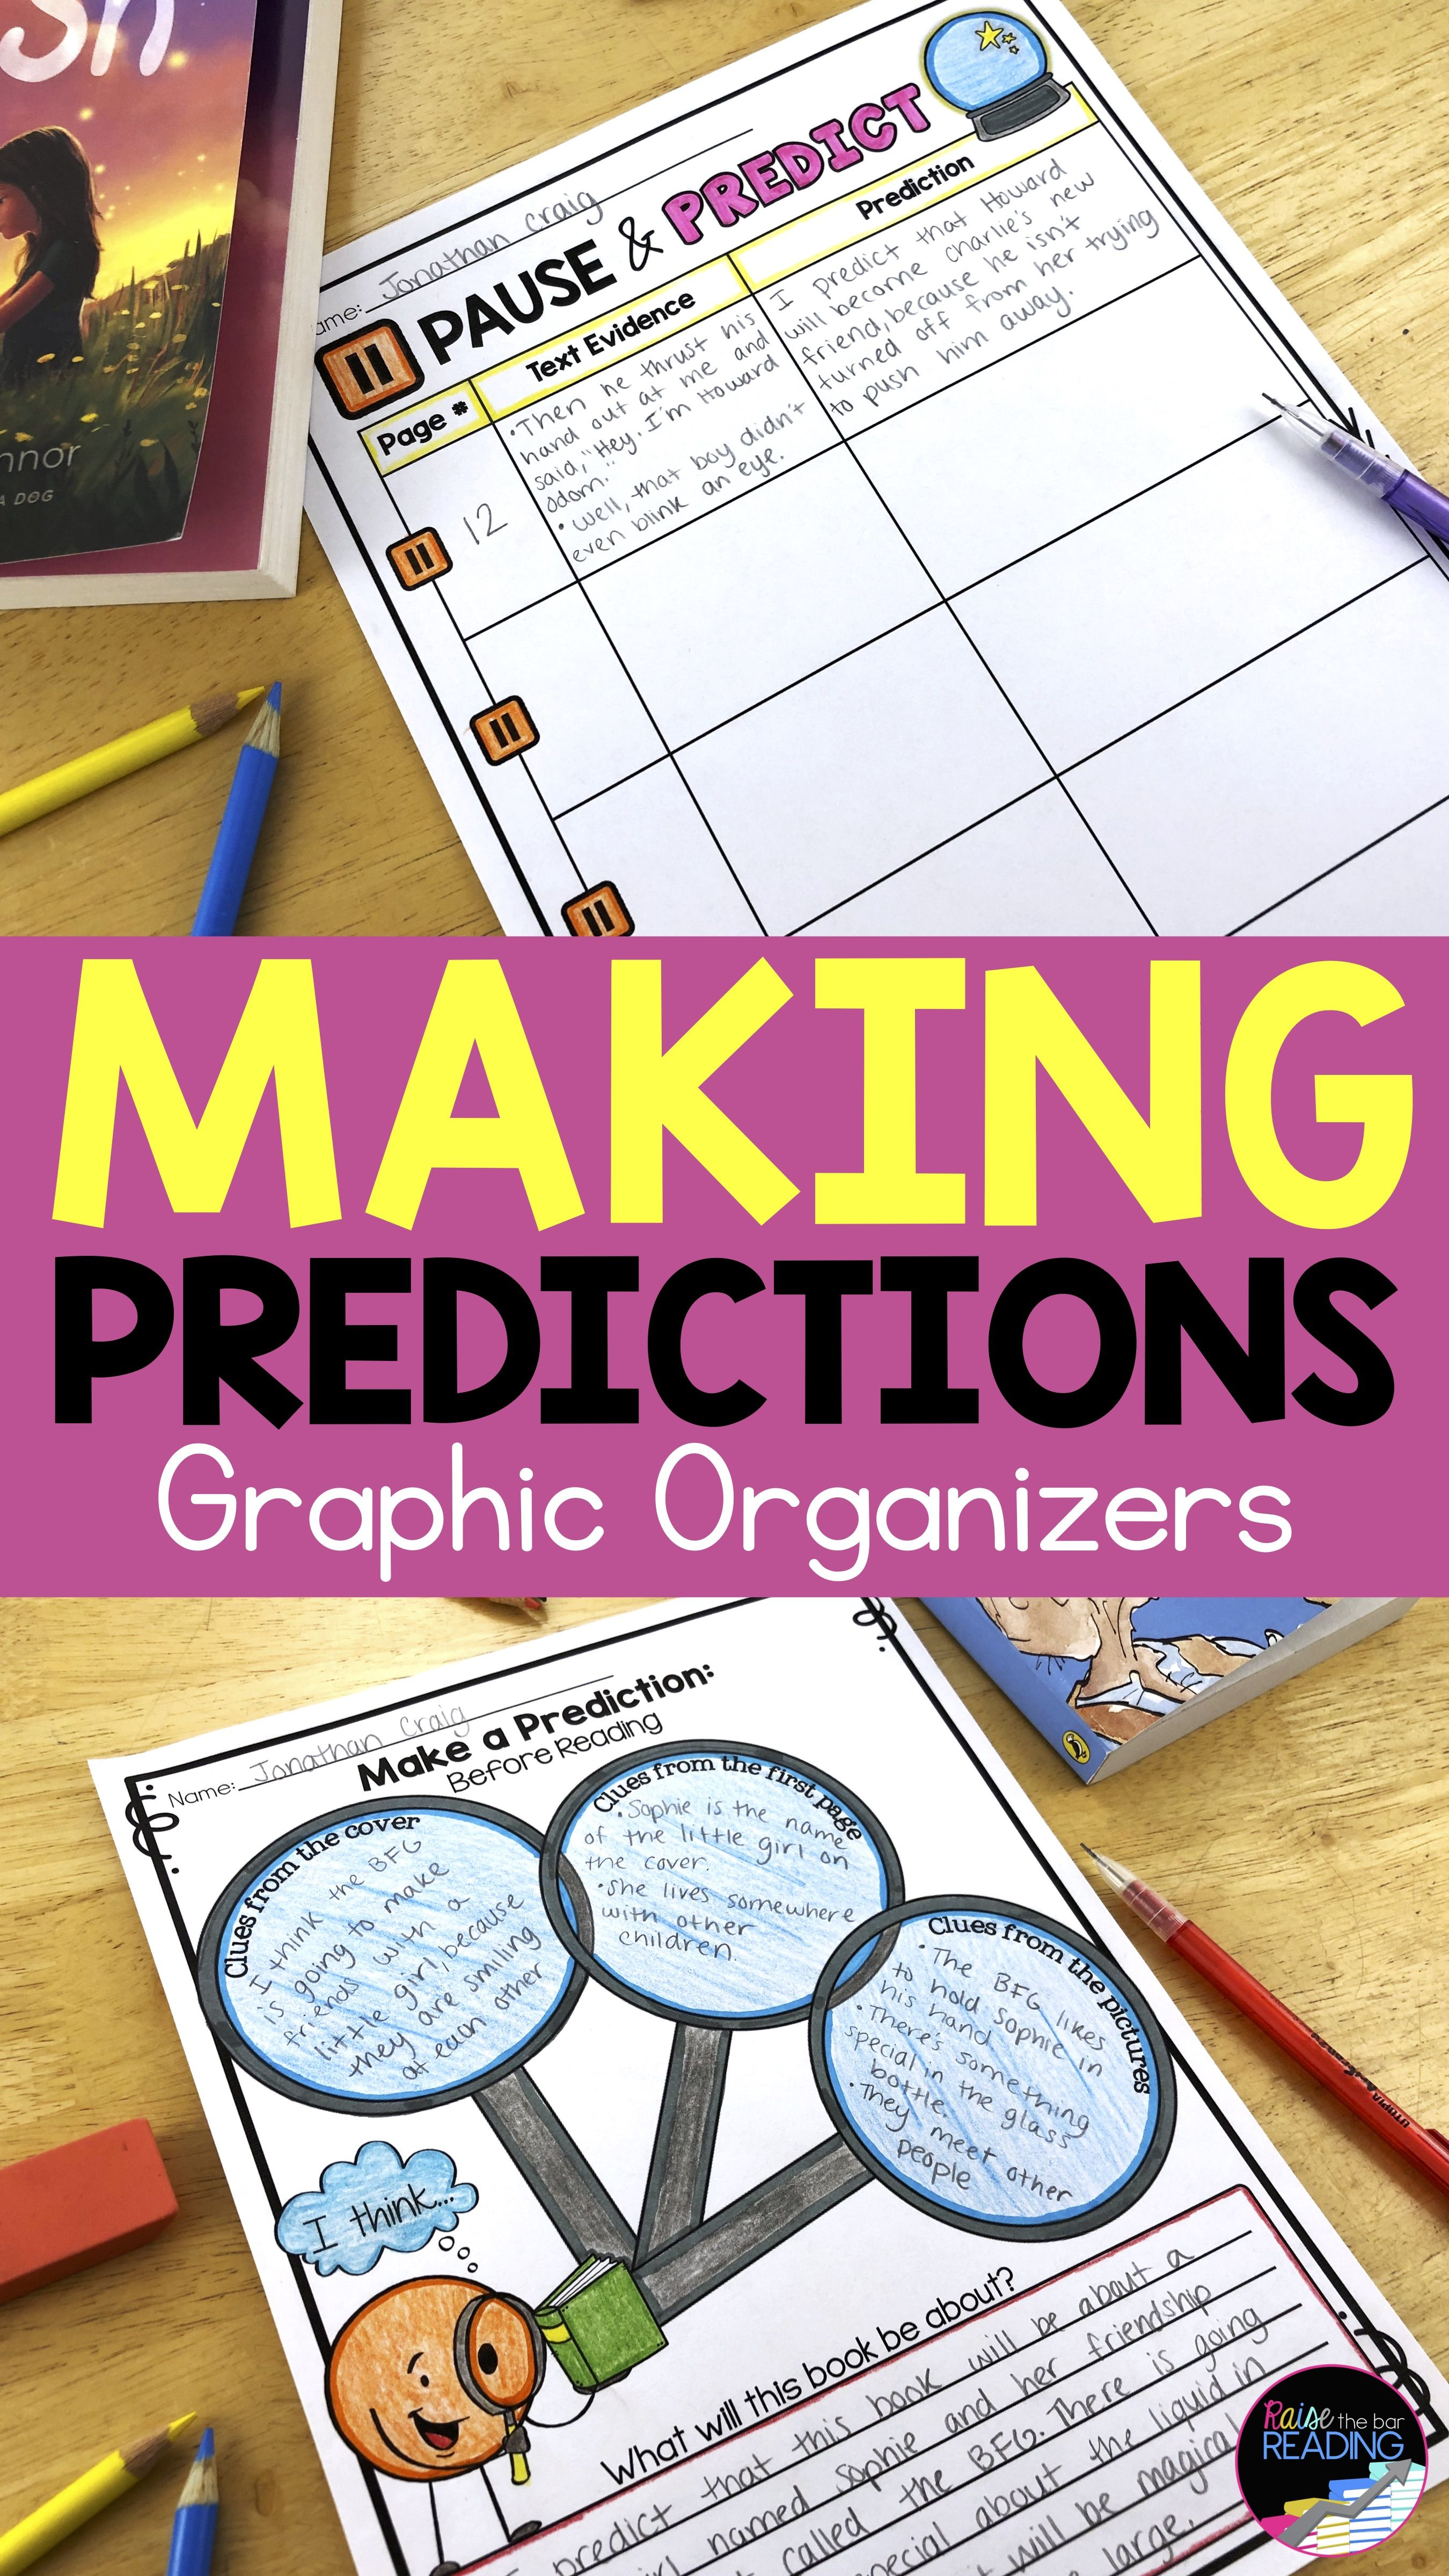 Making Predictions Graphic Organizer Poster Amp Making